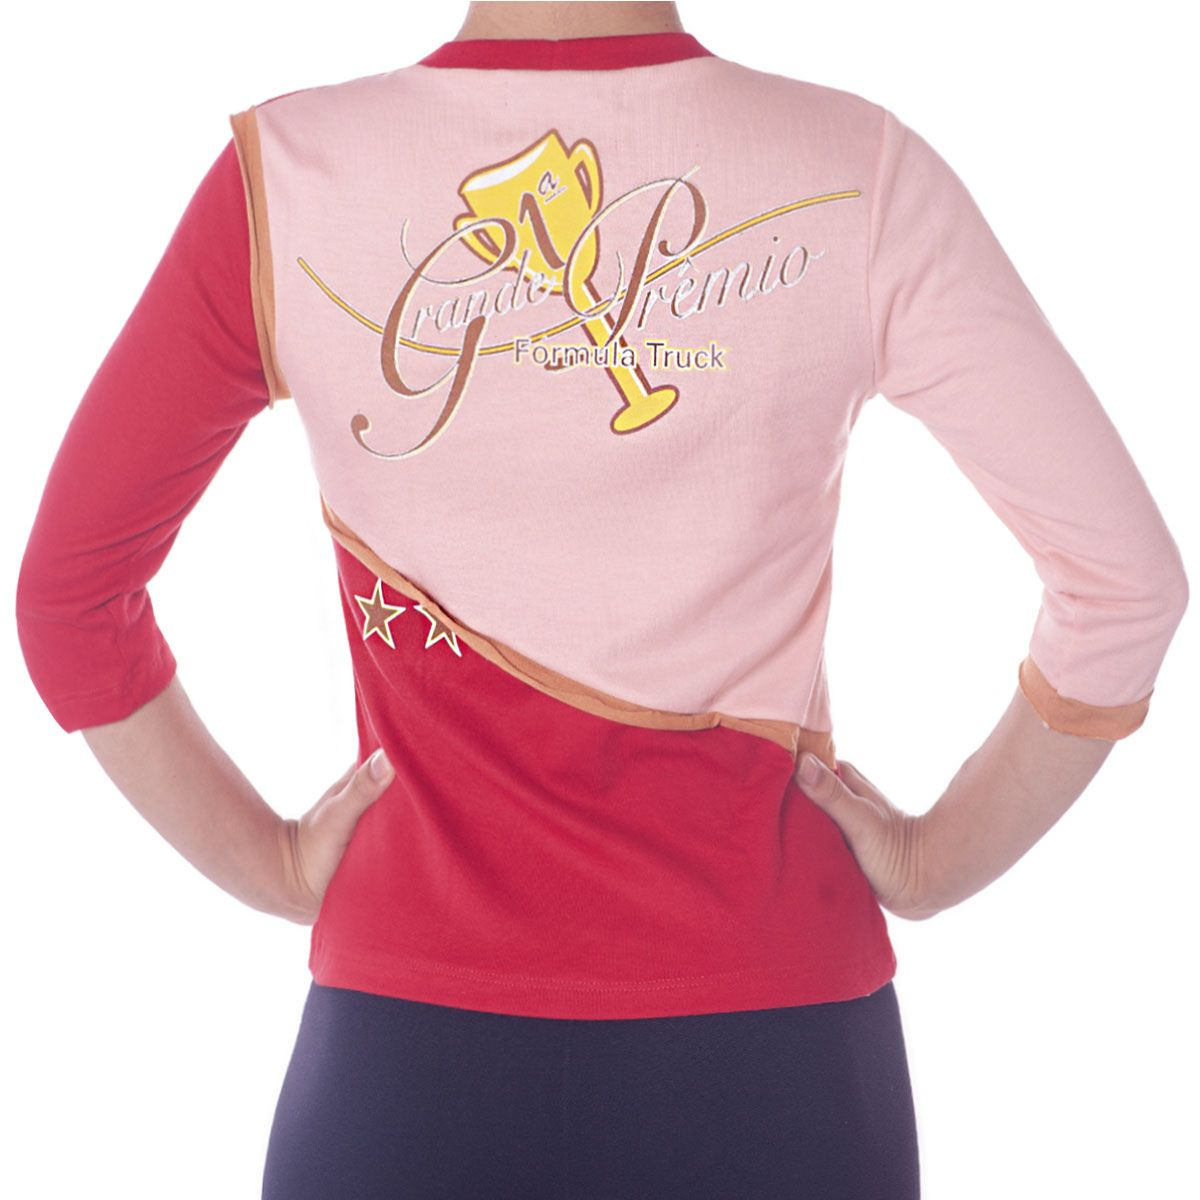 Camiseta Feminina Grande Premio Thais Gusmão -